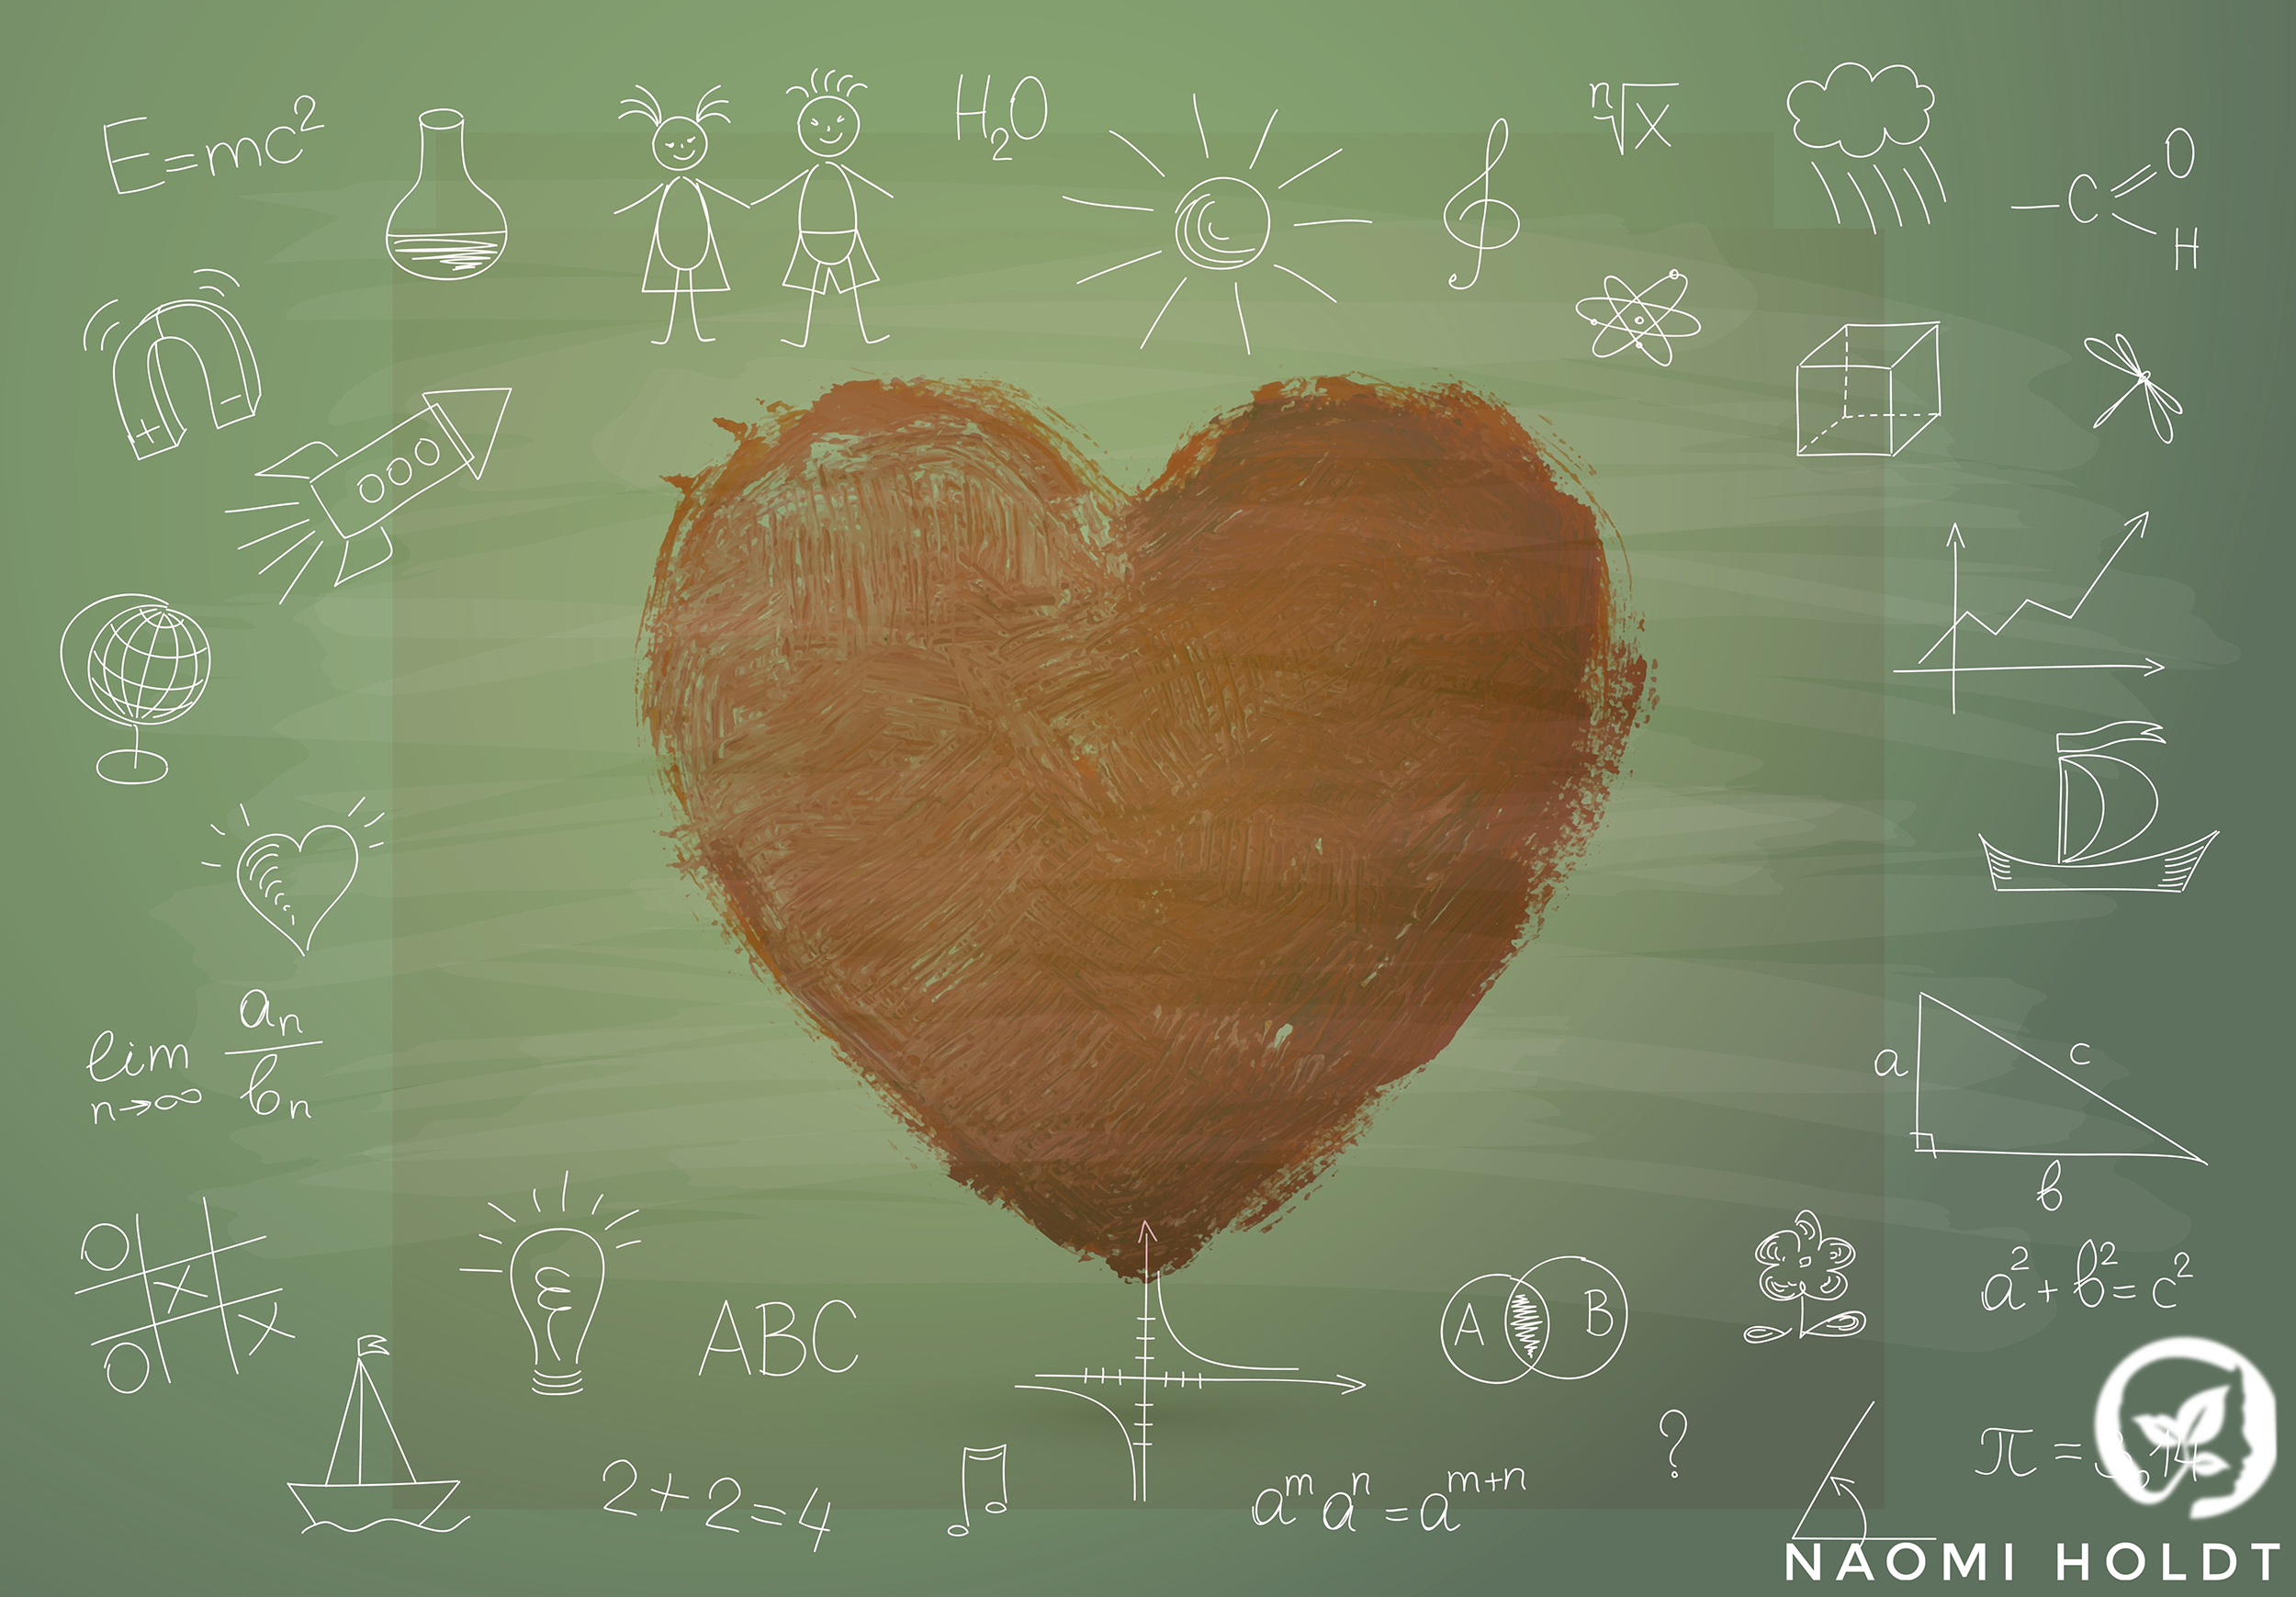 RETHINKING THE HEART OF EDUCATION...